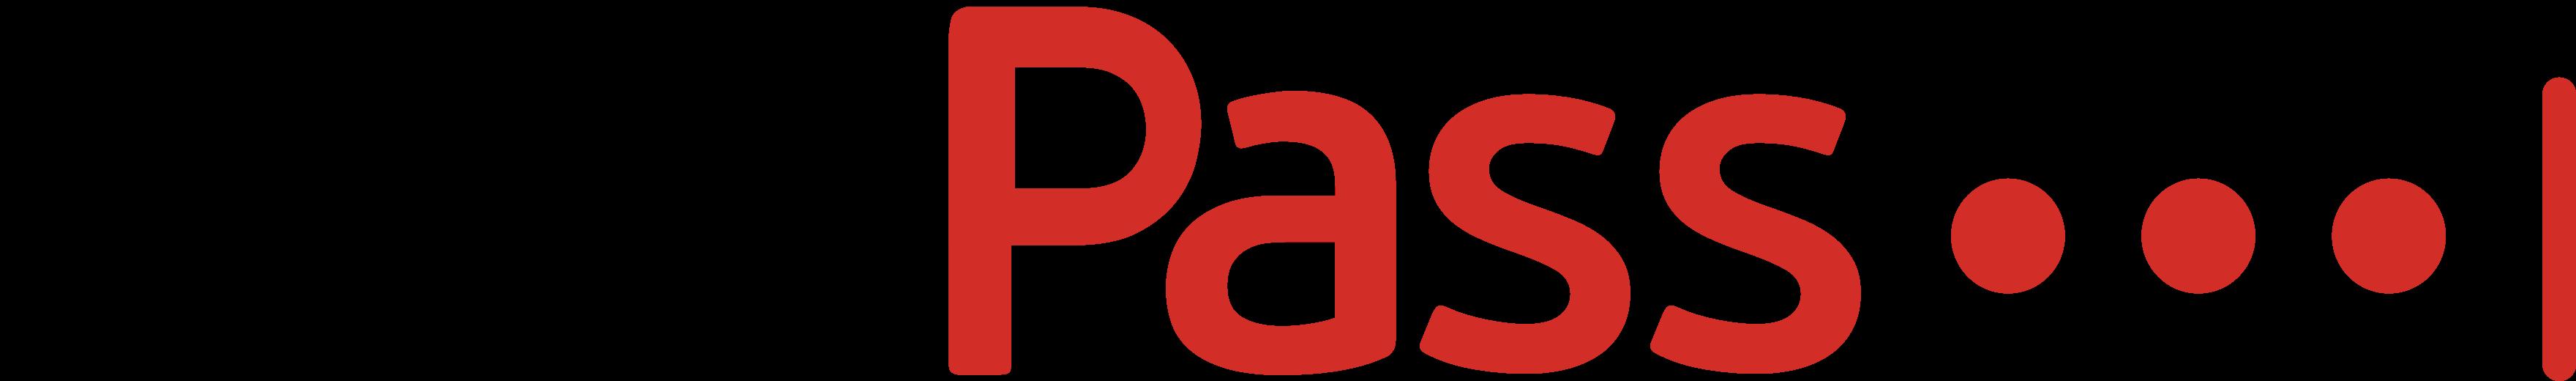 LastPass.